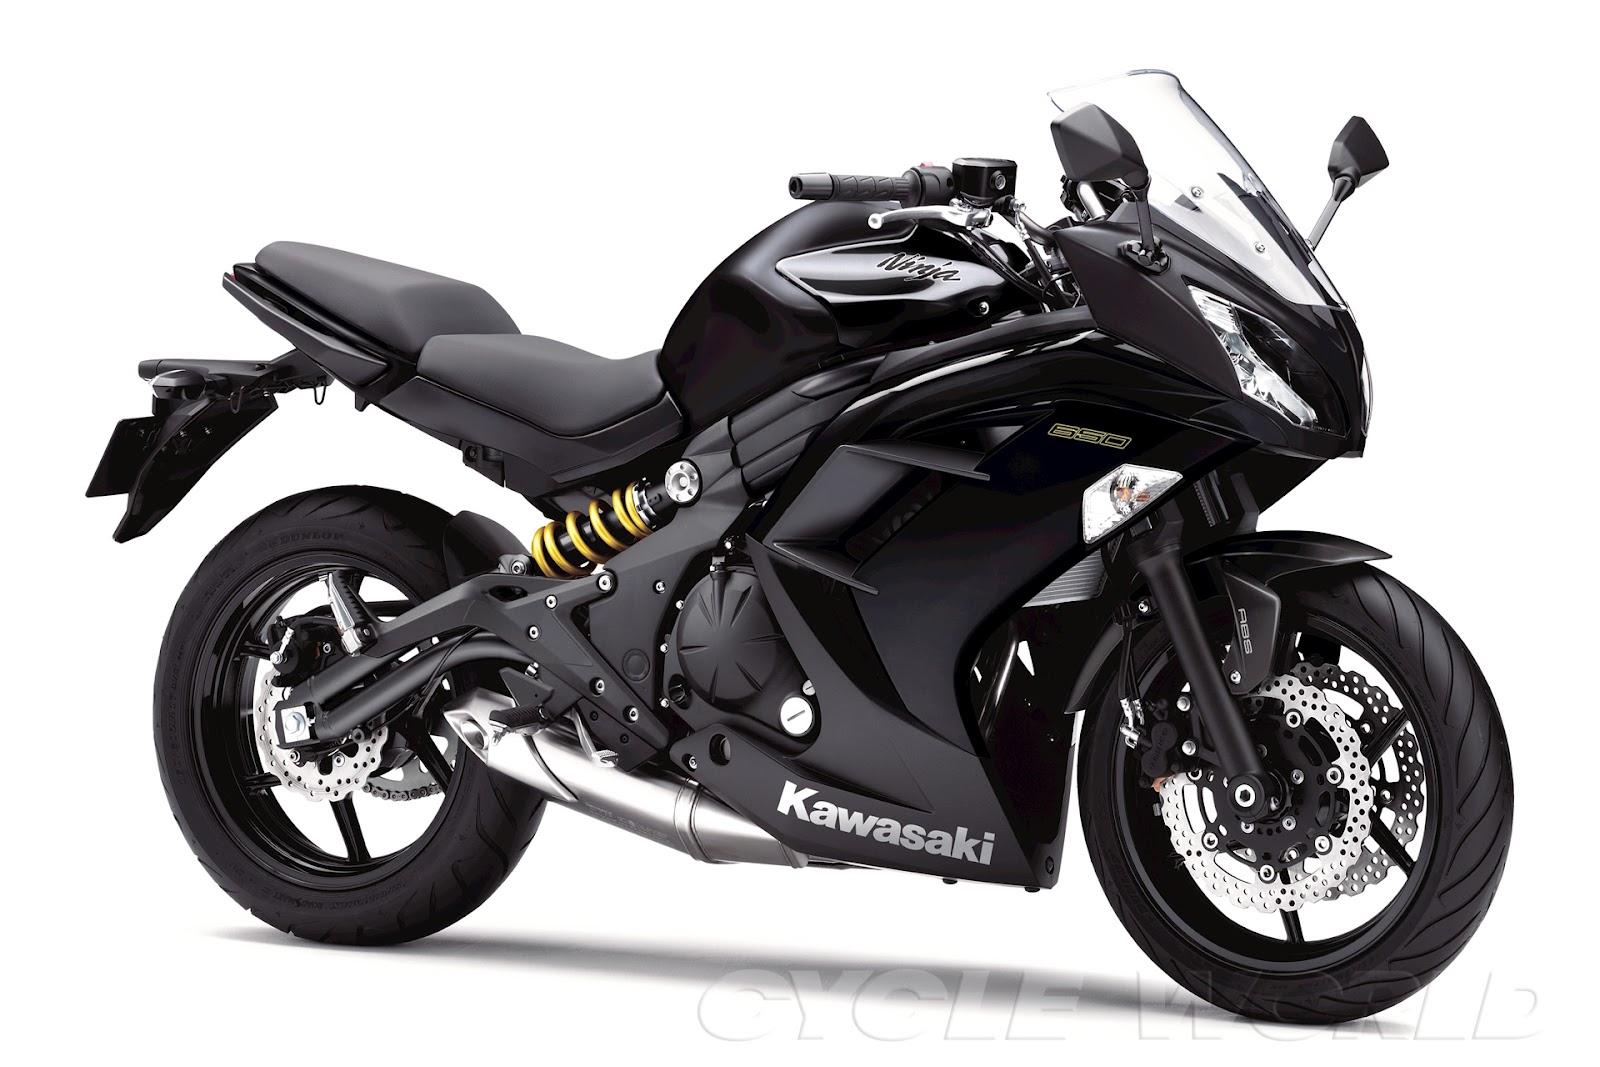 http://4.bp.blogspot.com/-bmu8hWYdh_8/UASSDyI6gBI/AAAAAAAAASg/xr1stpfEJms/s1600/2013-Ninja-650-ABS-black34.jpg